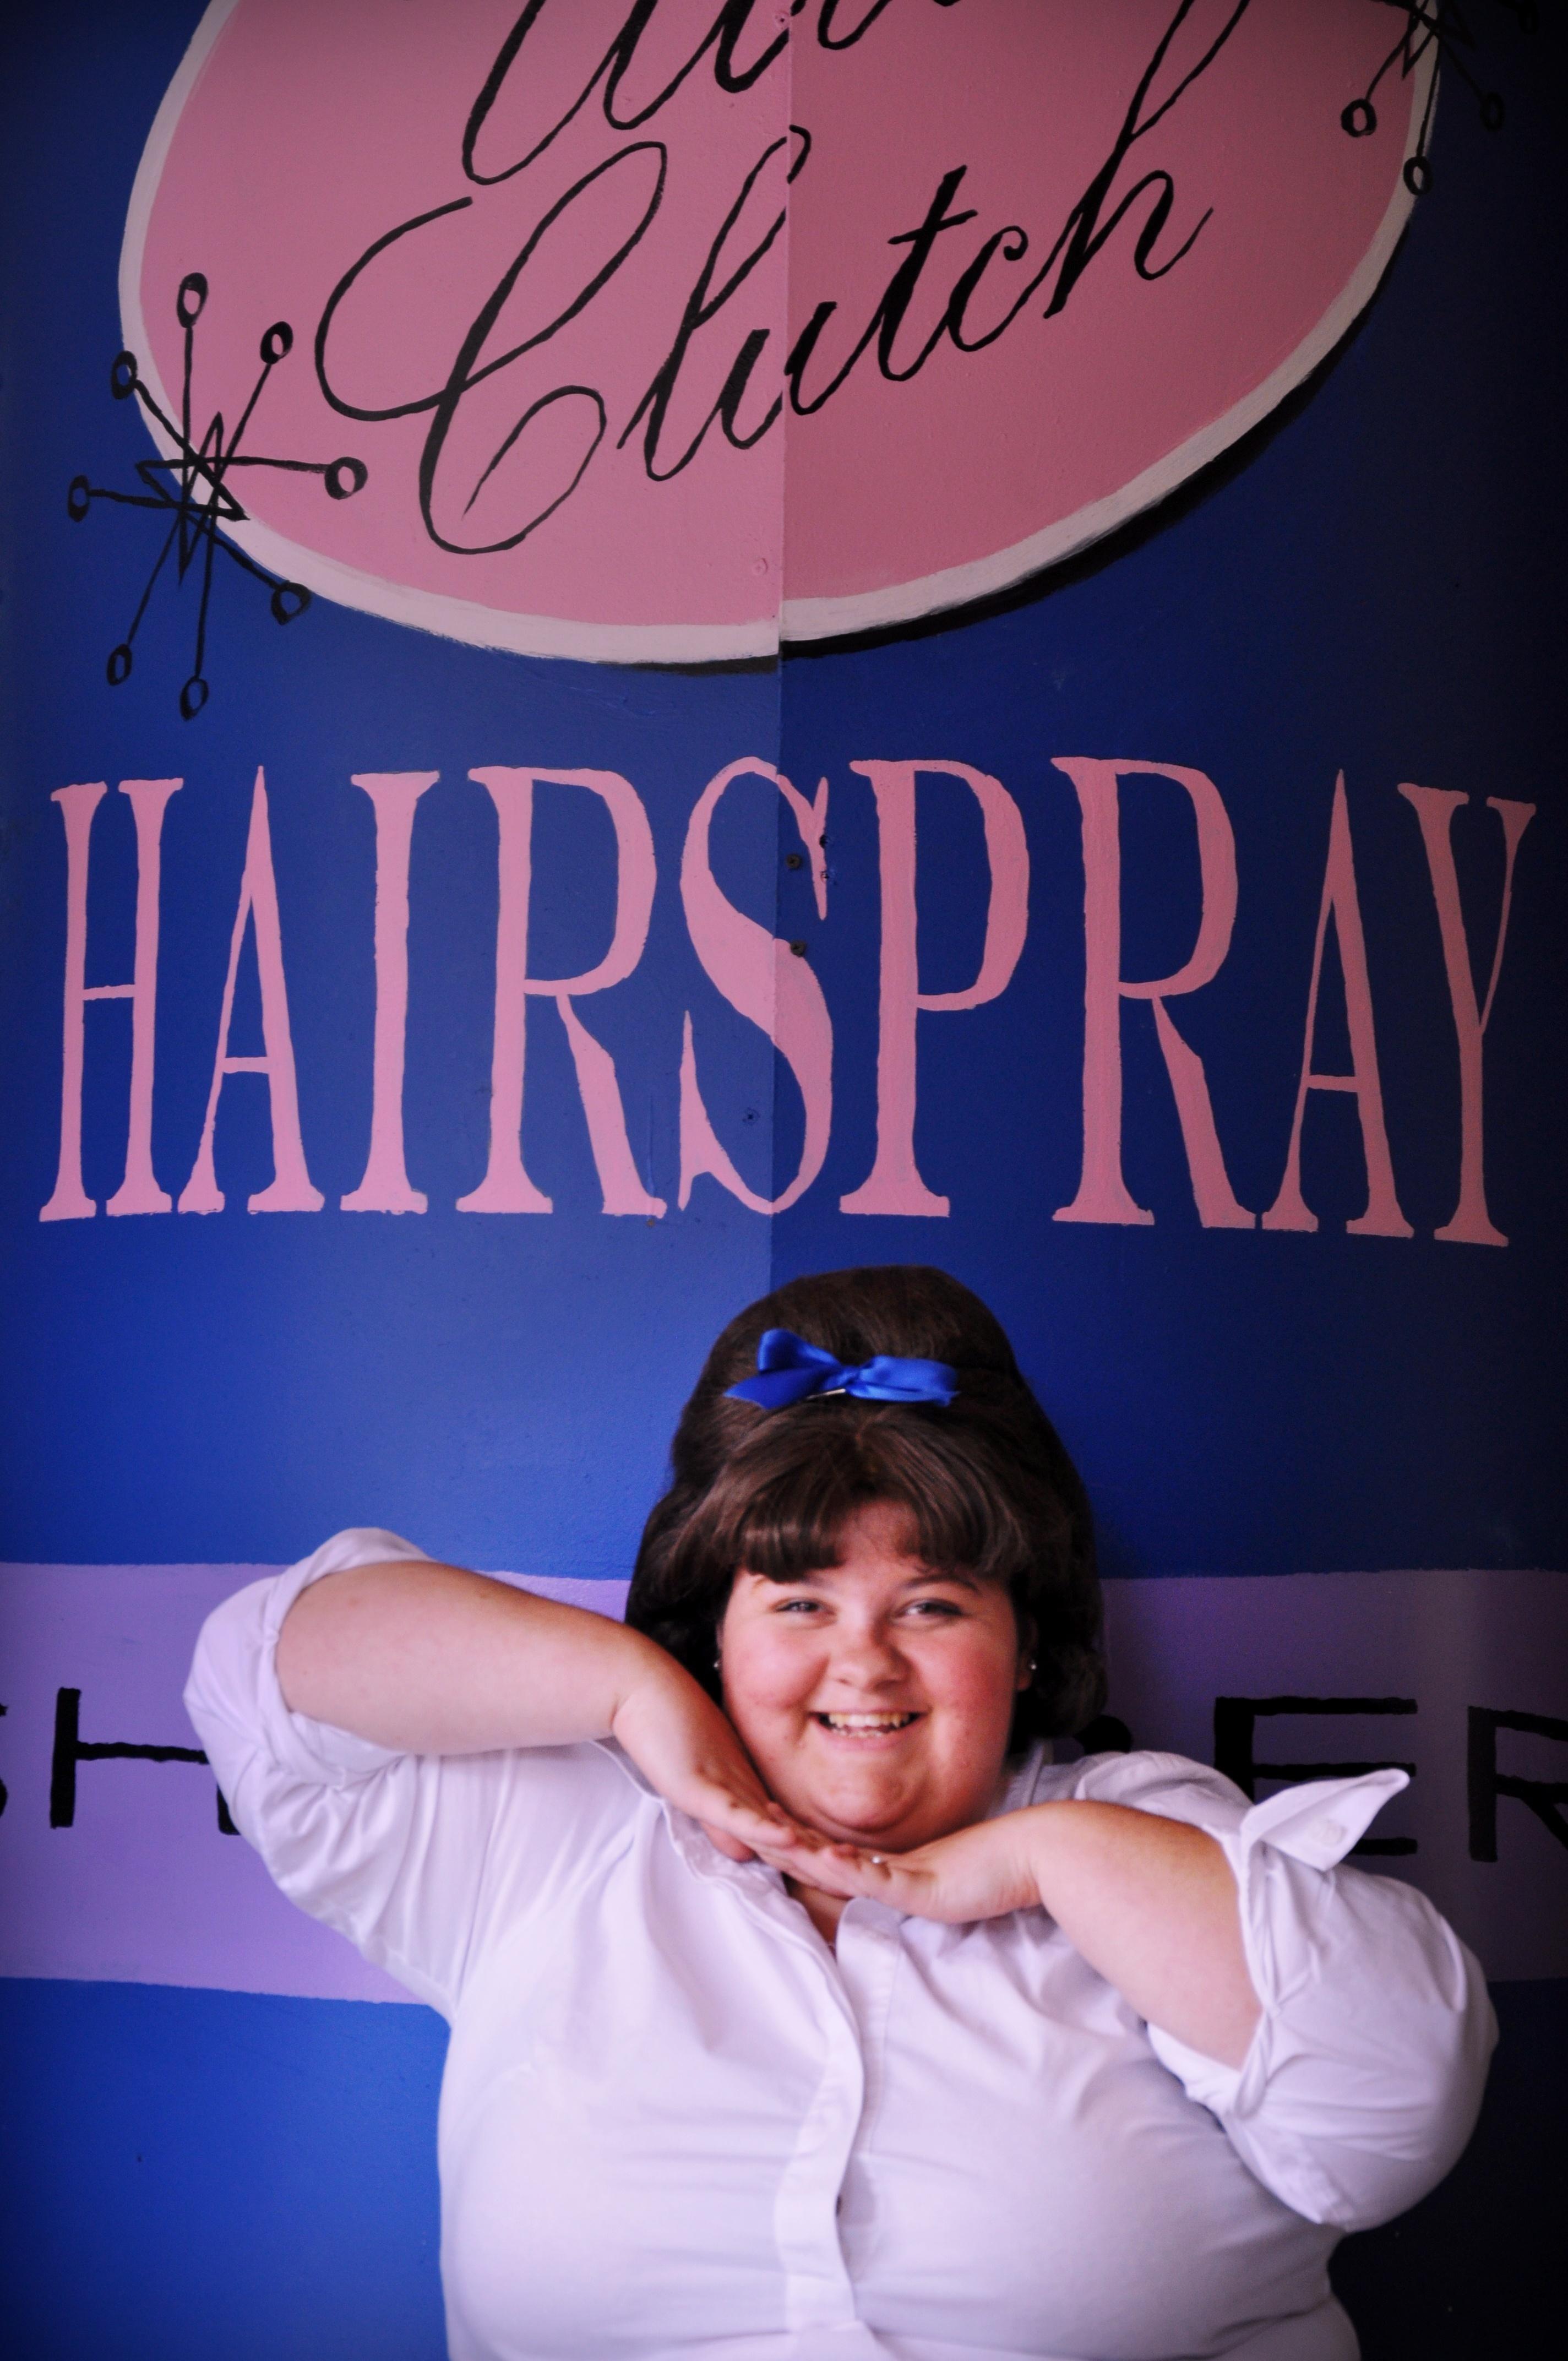 Hairspray 2011